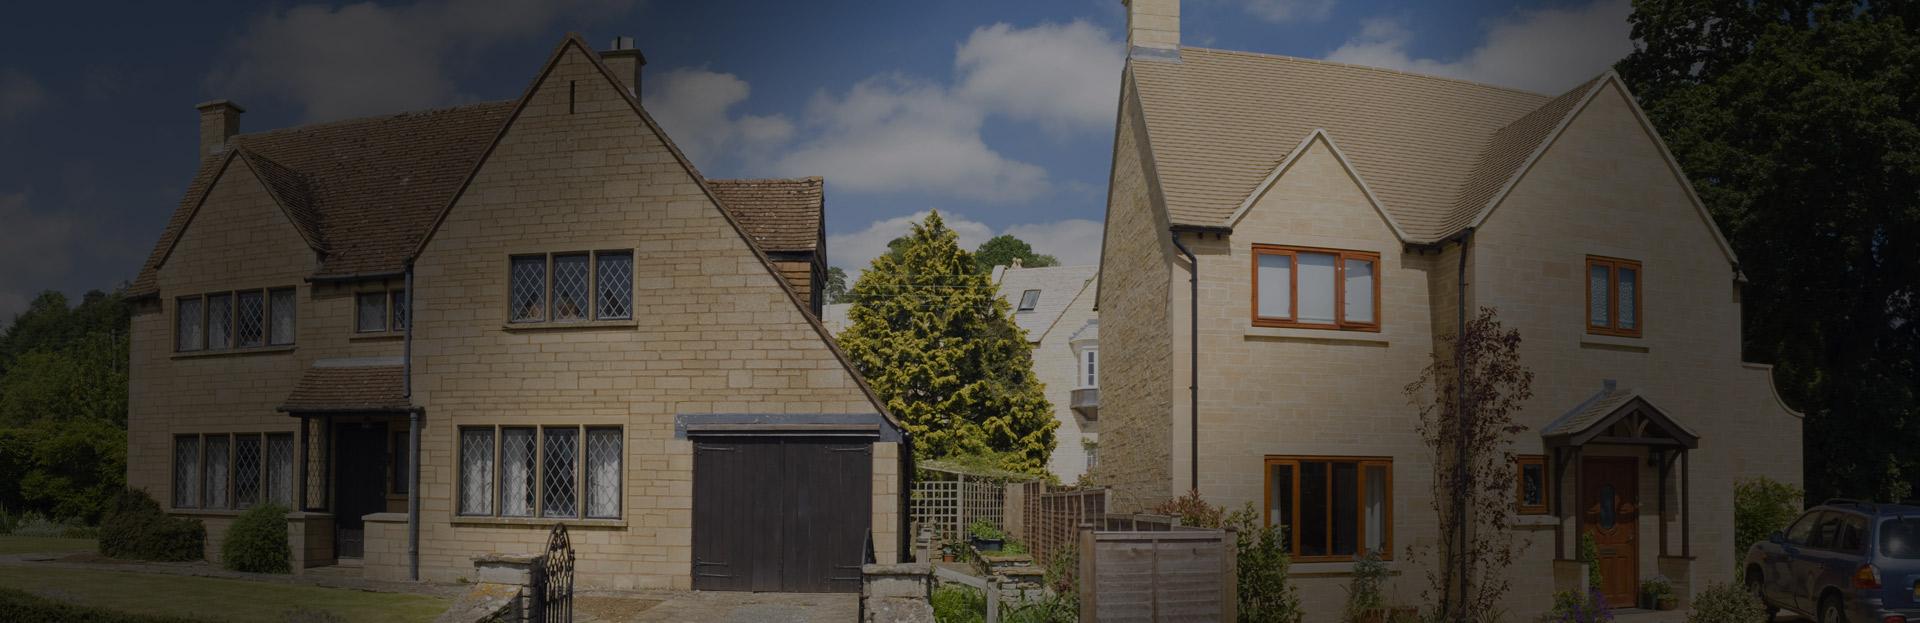 We offer a range of building services